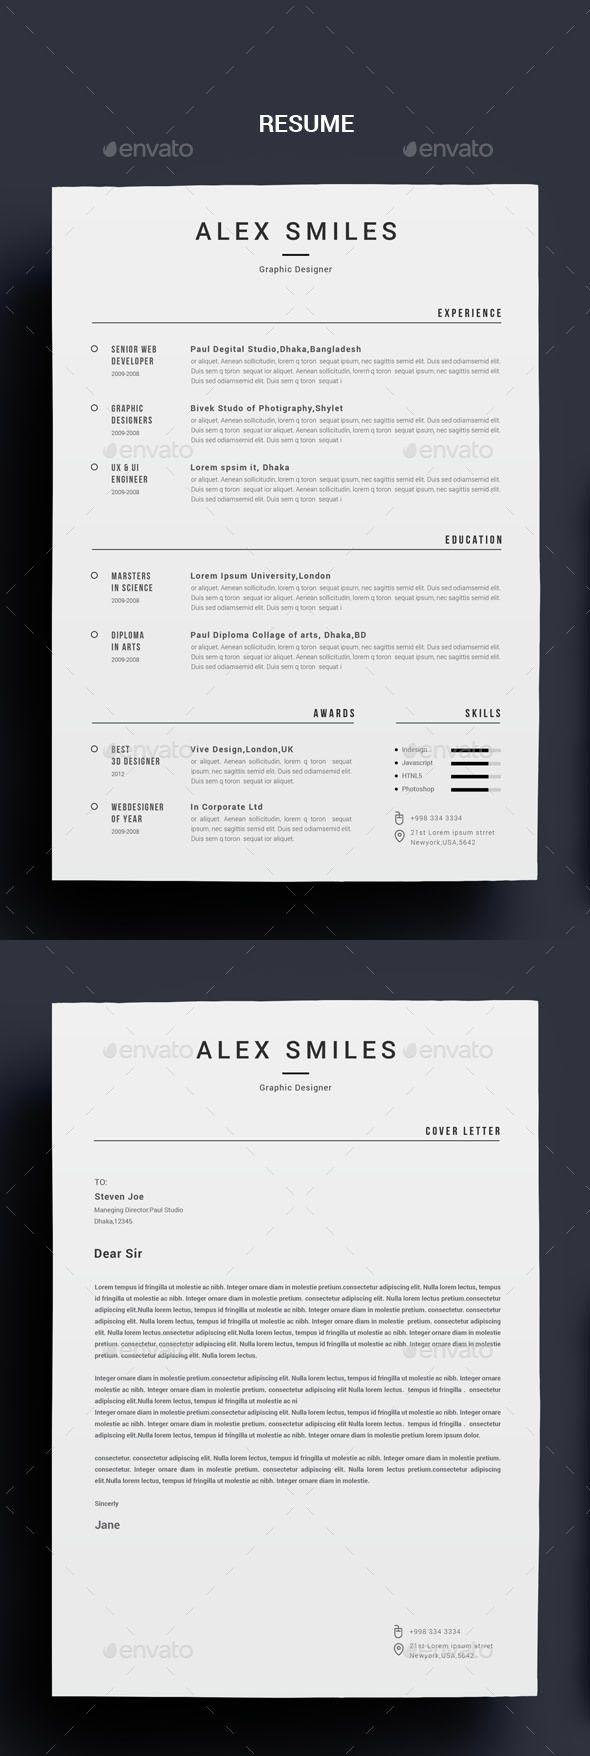 Resume — Photoshop PSD #creative resume/cv #professional resume/cv • Download ➝ https://graphicriver.net/item/resume/18942362?ref=pxcr